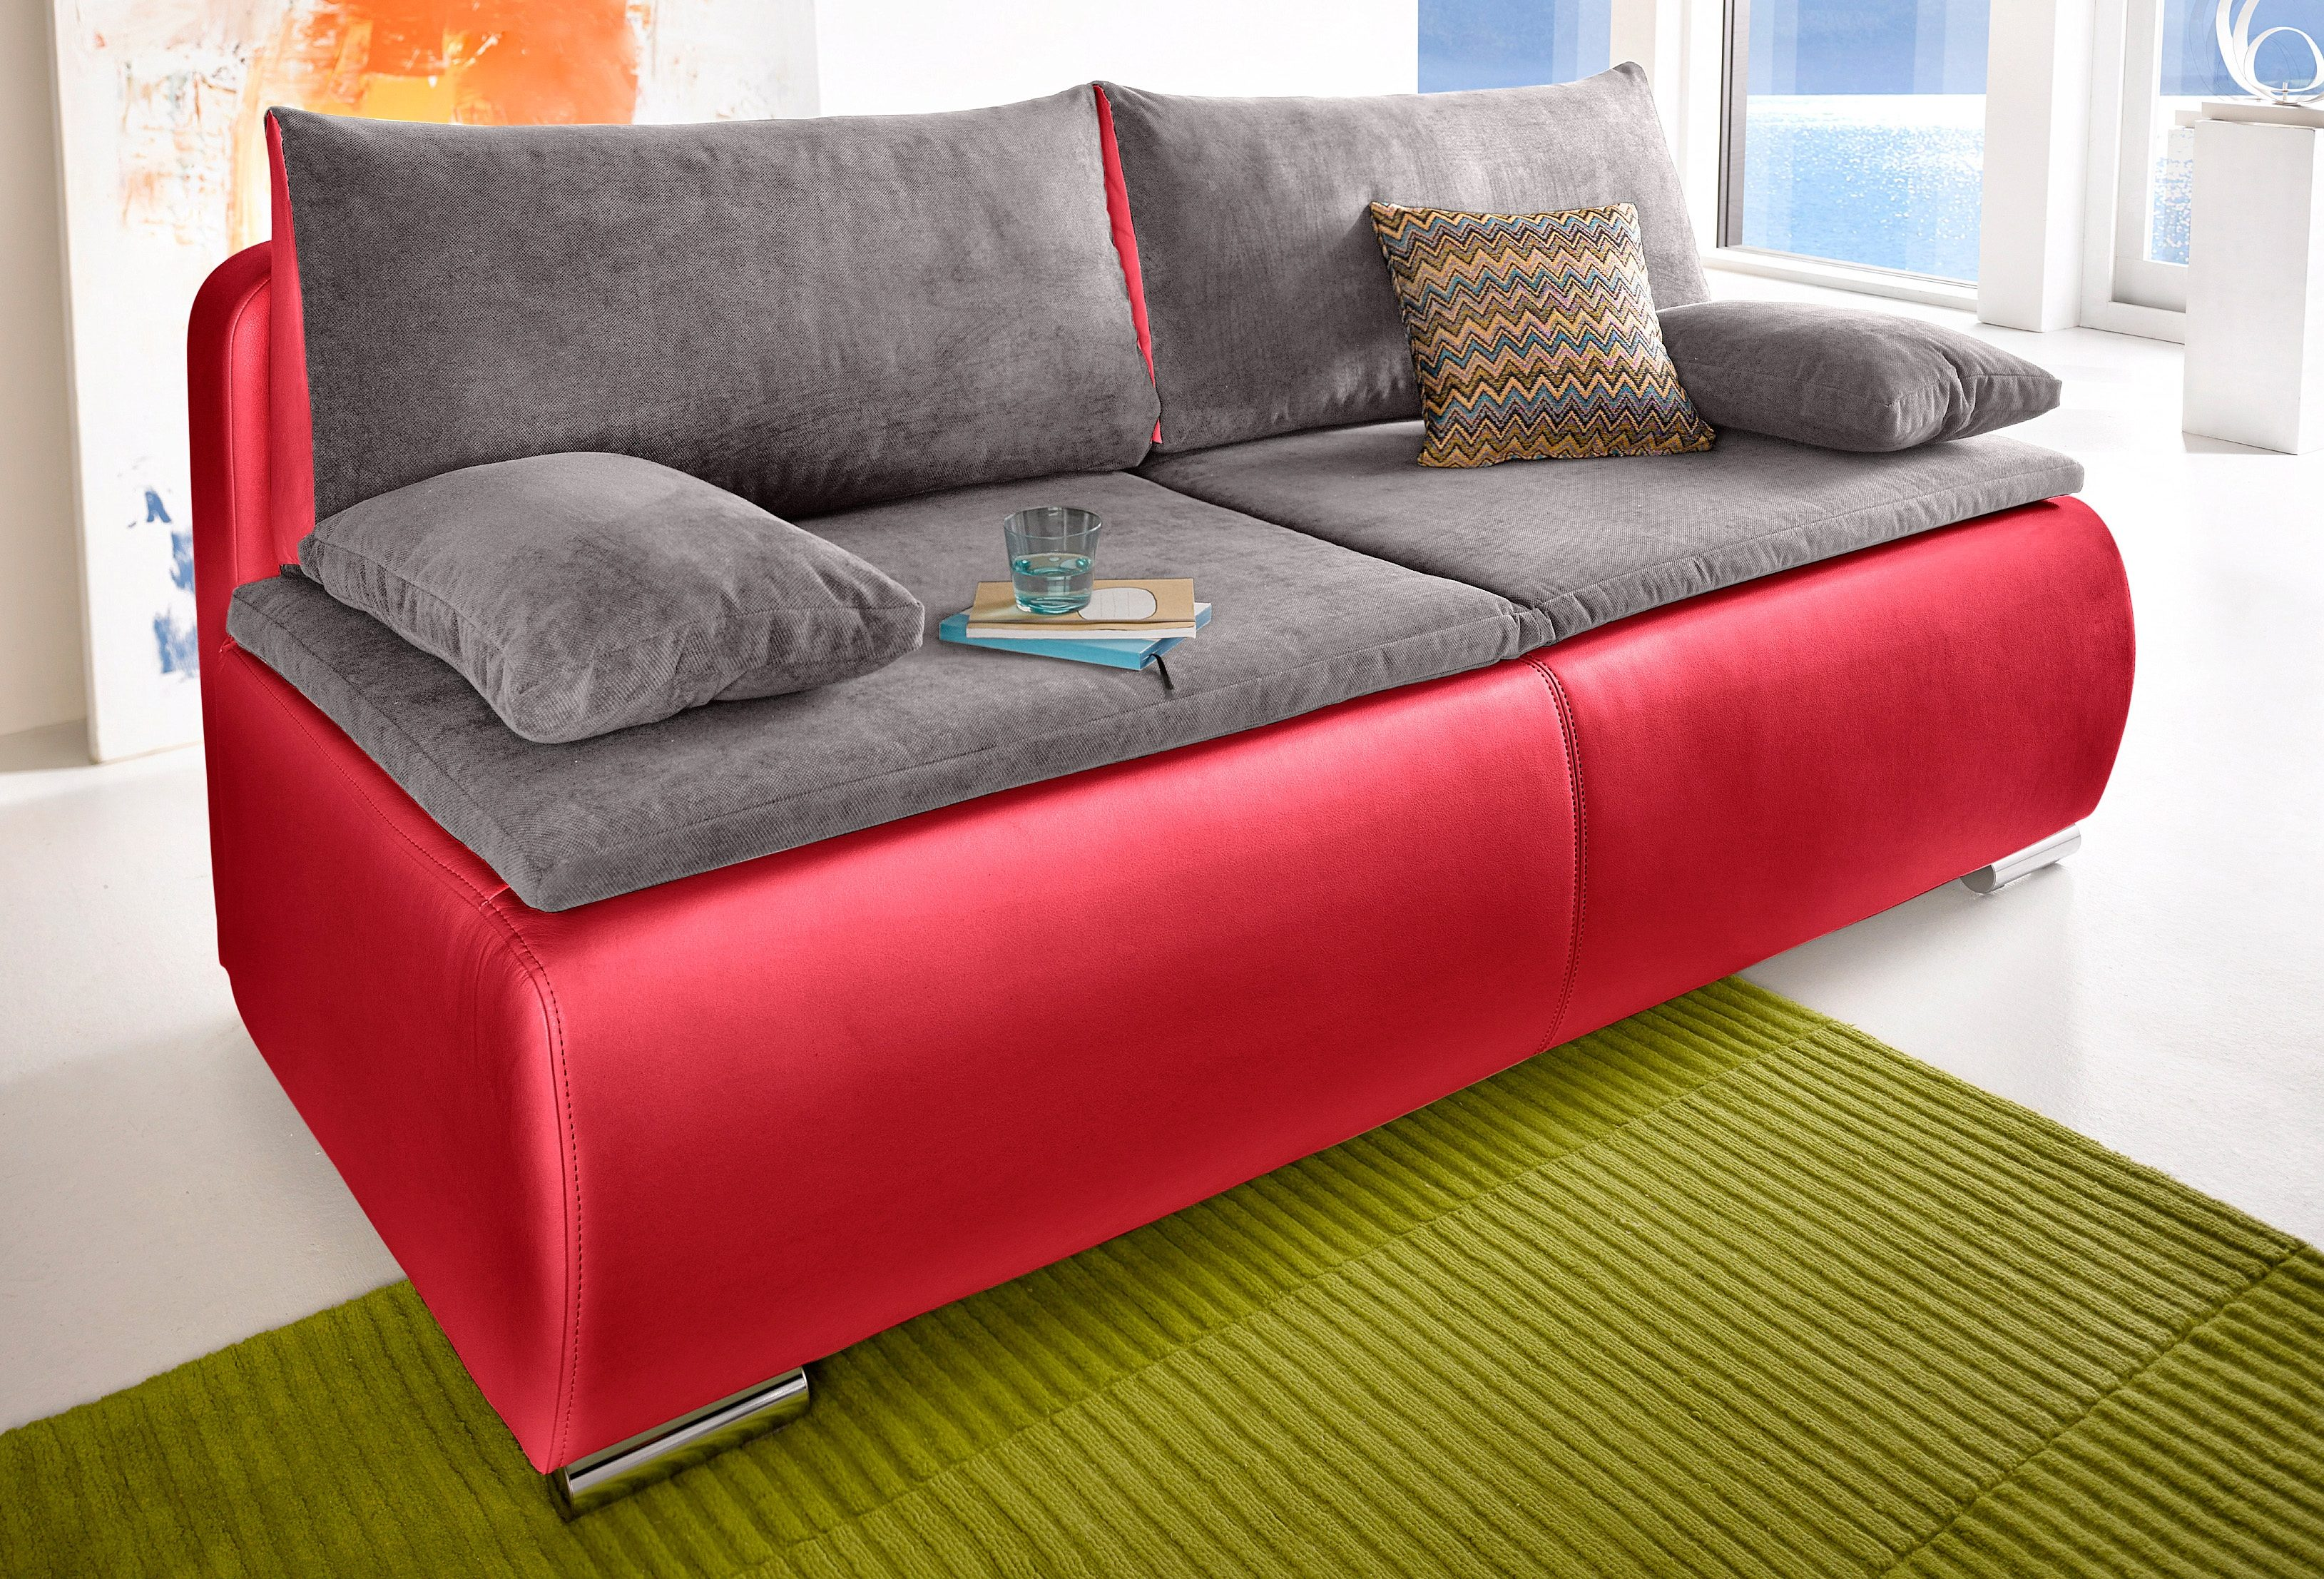 collection ab schlafsofa online kaufen. Black Bedroom Furniture Sets. Home Design Ideas